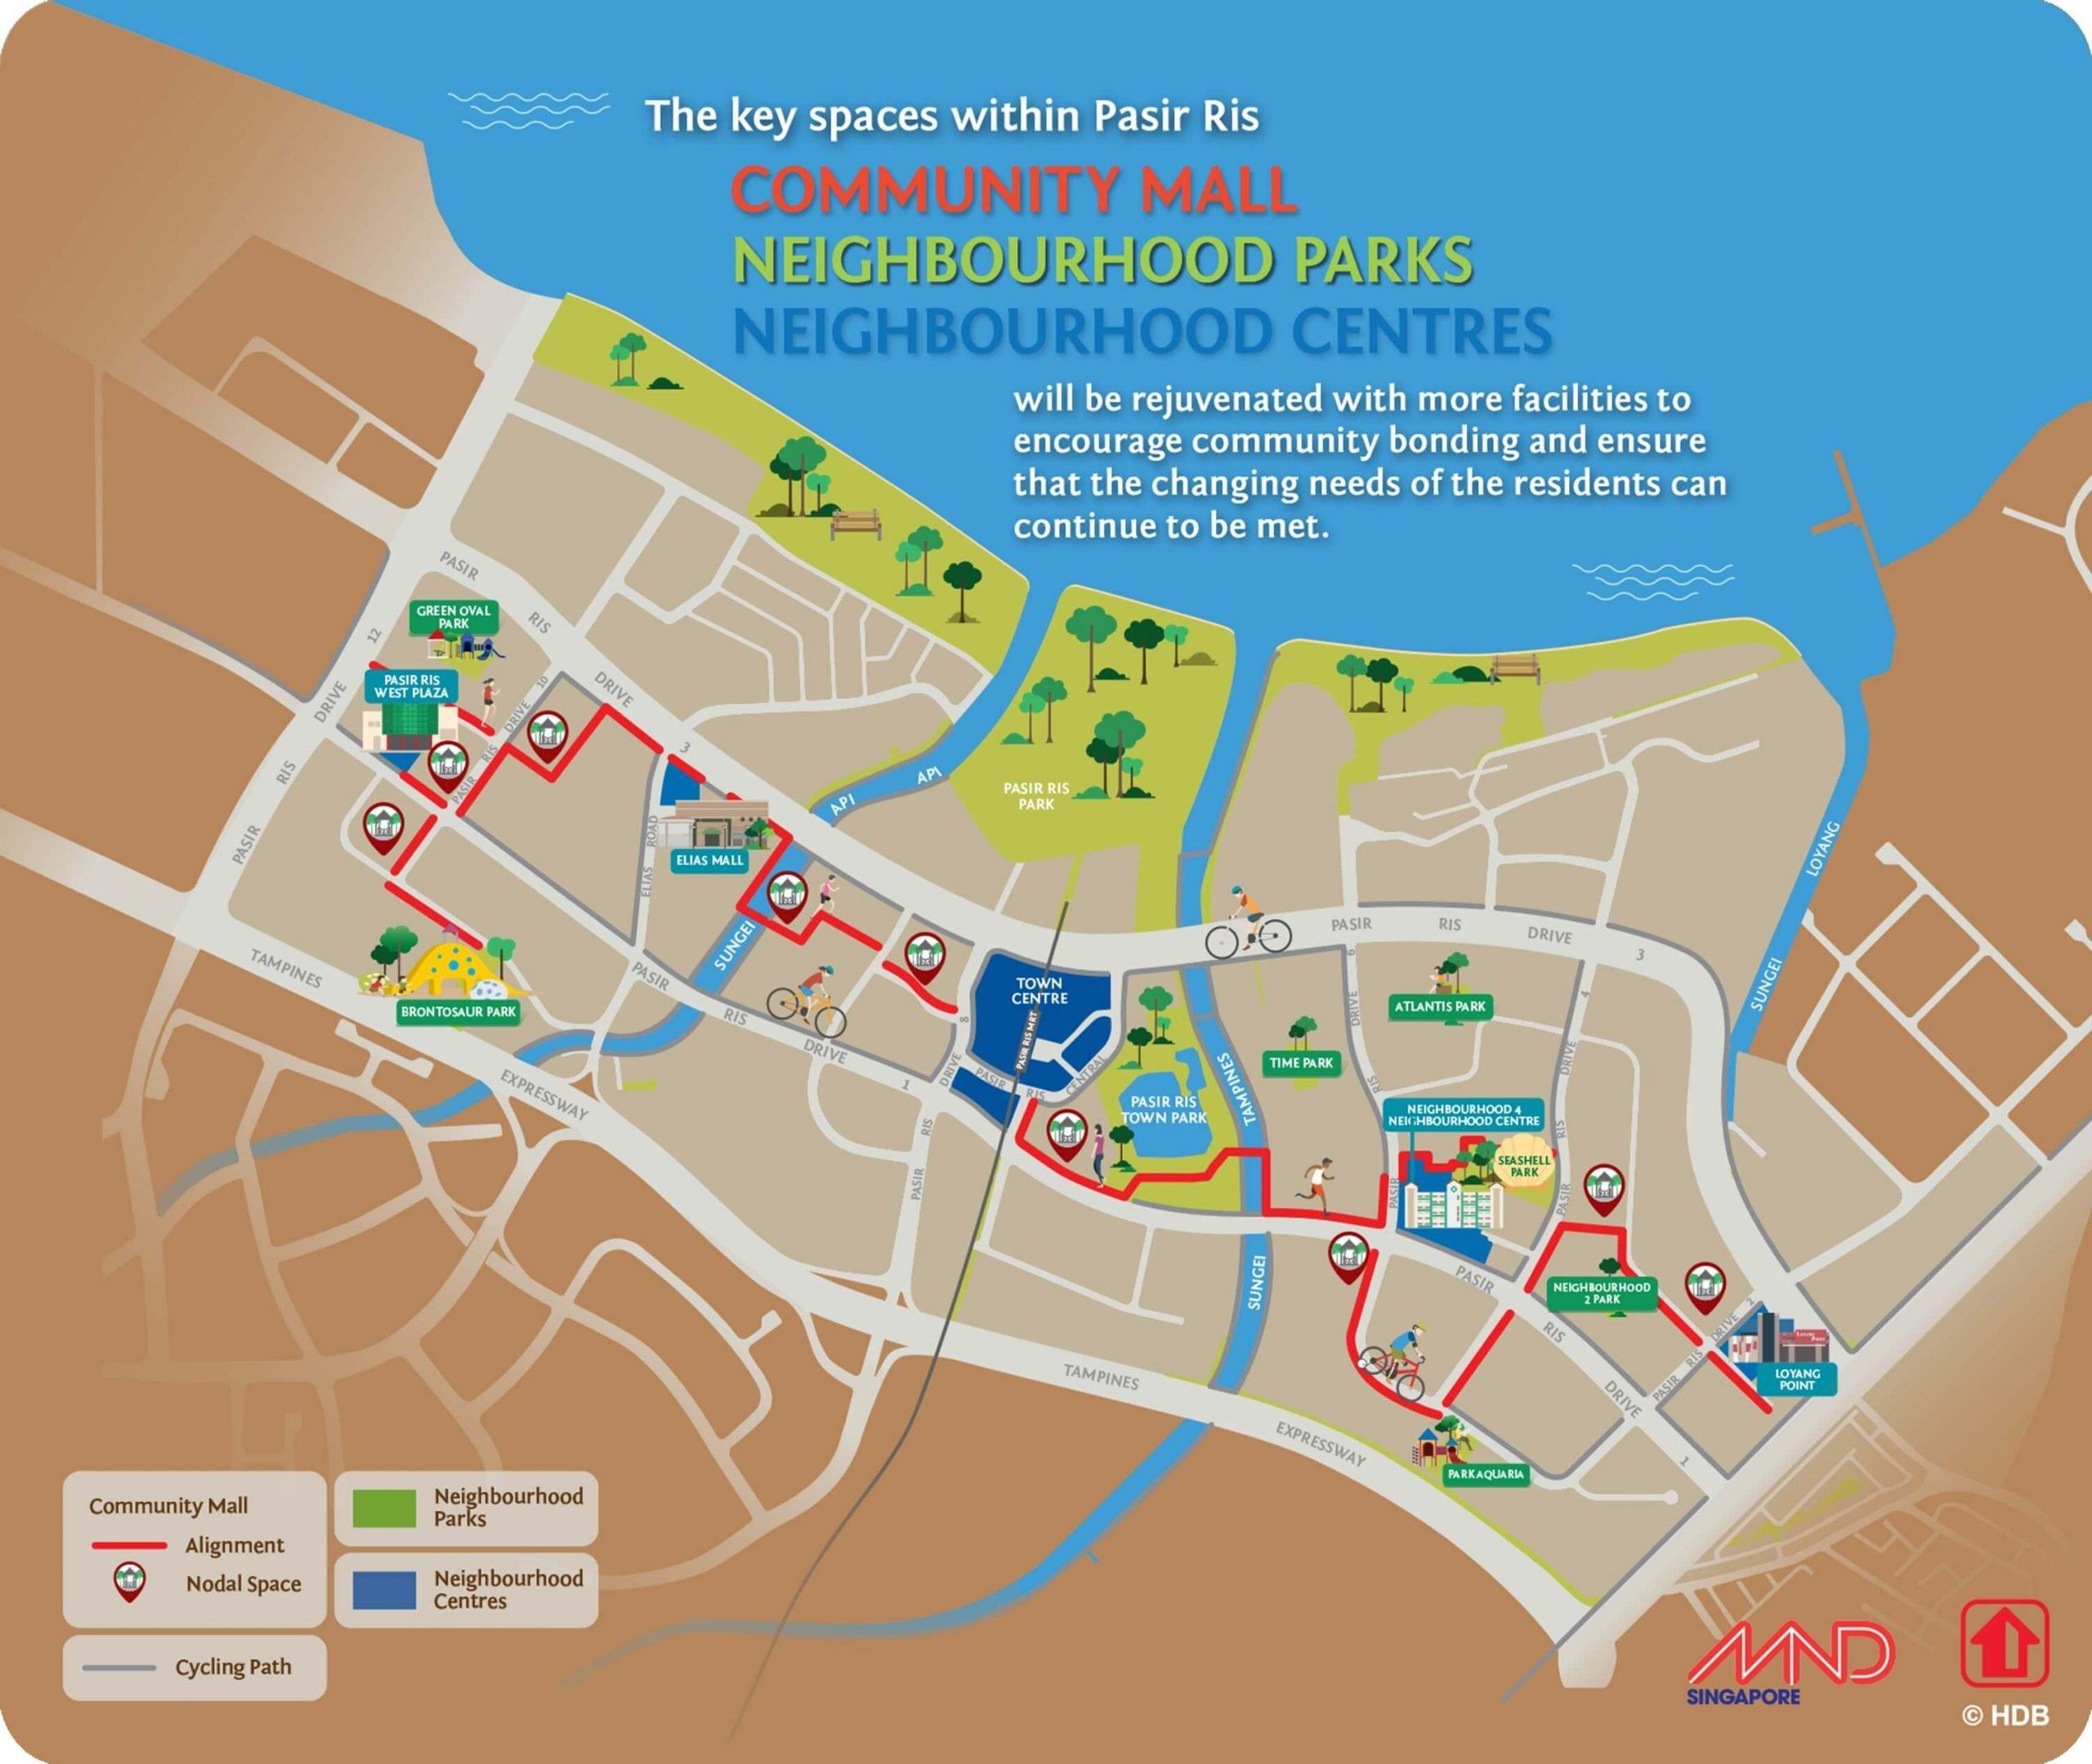 Pasir Ris 8 Community Mall Neighbourhood Parks Centres 1 scaled